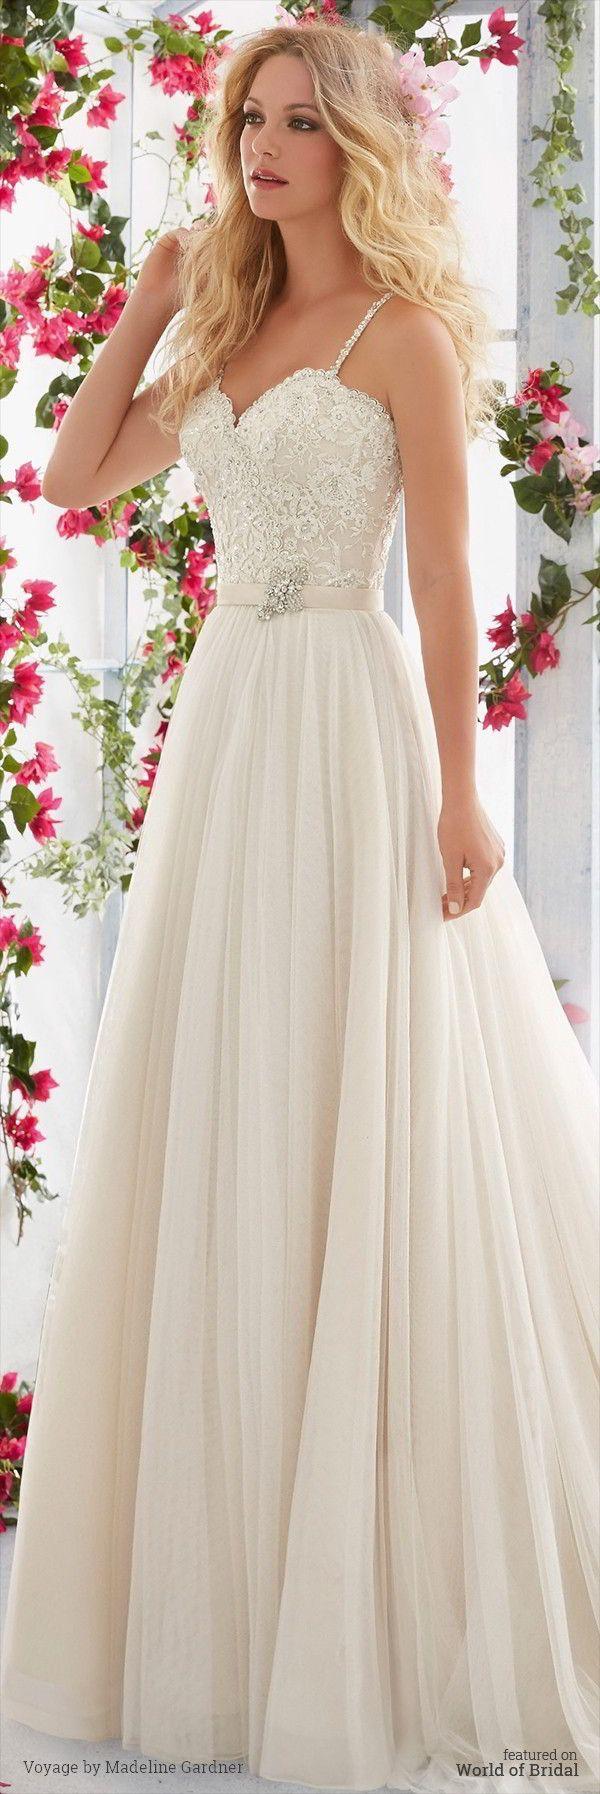 Informal wedding dresses for second marriage  Voyage by Madeline Gardner Spring  Wedding Dress  Unique